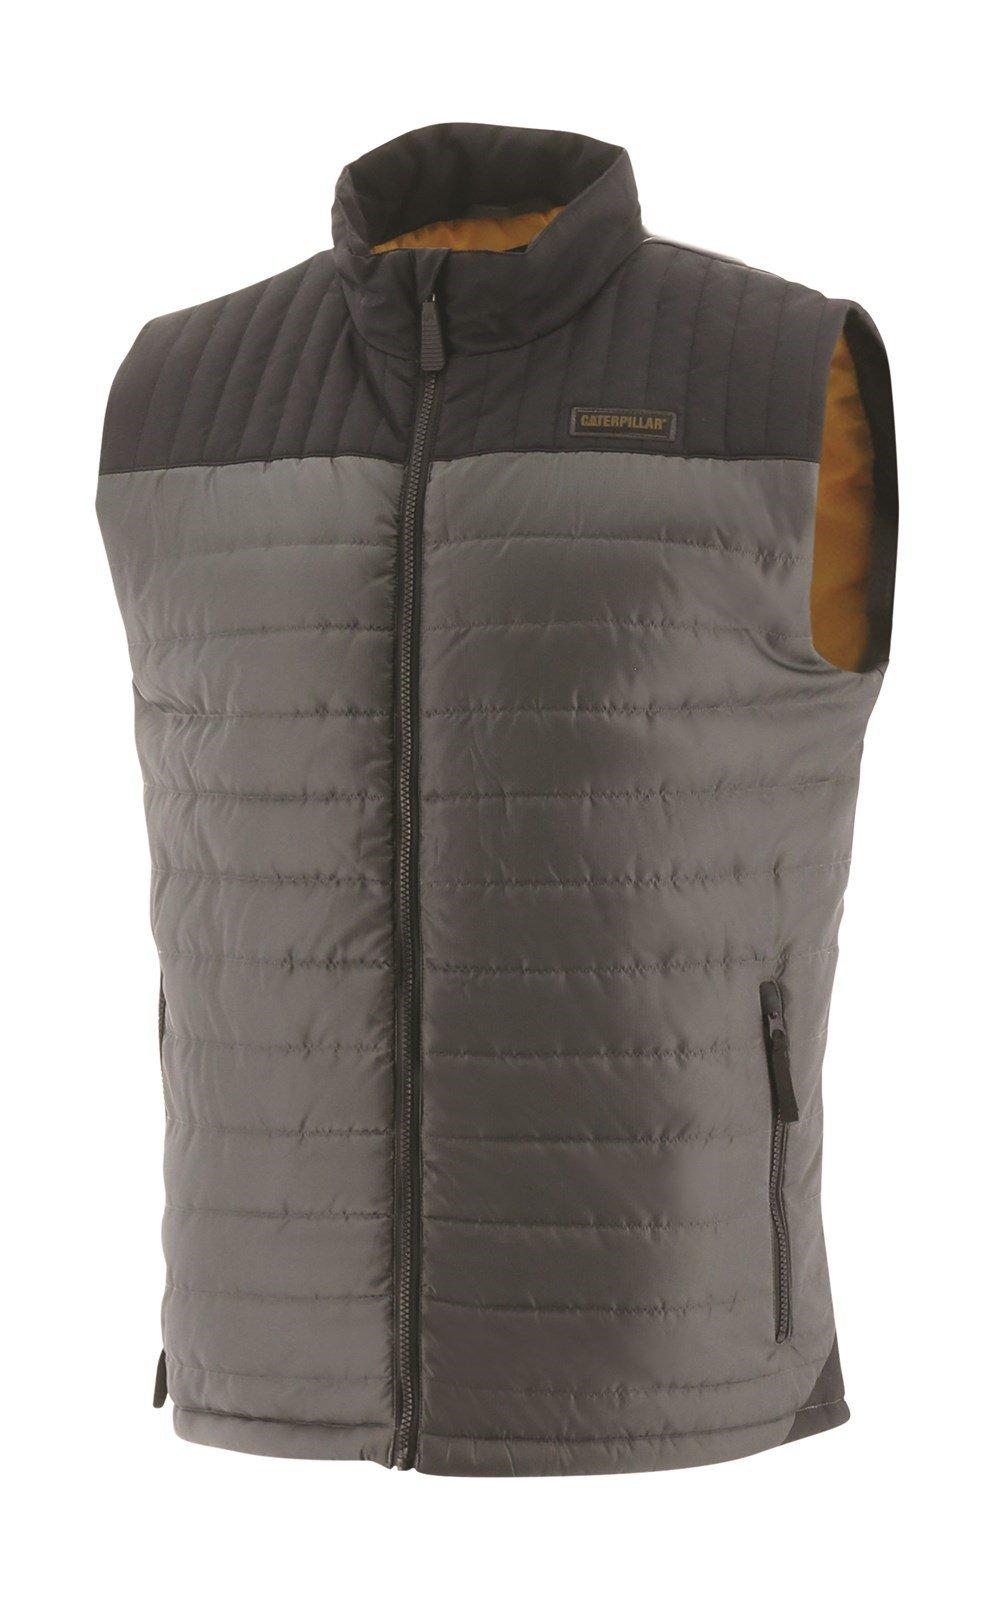 Caterpillar Unisex Squall Vest Body Warmer Sweatshirt Dark Marine 31678 - Dark Shadow Sml